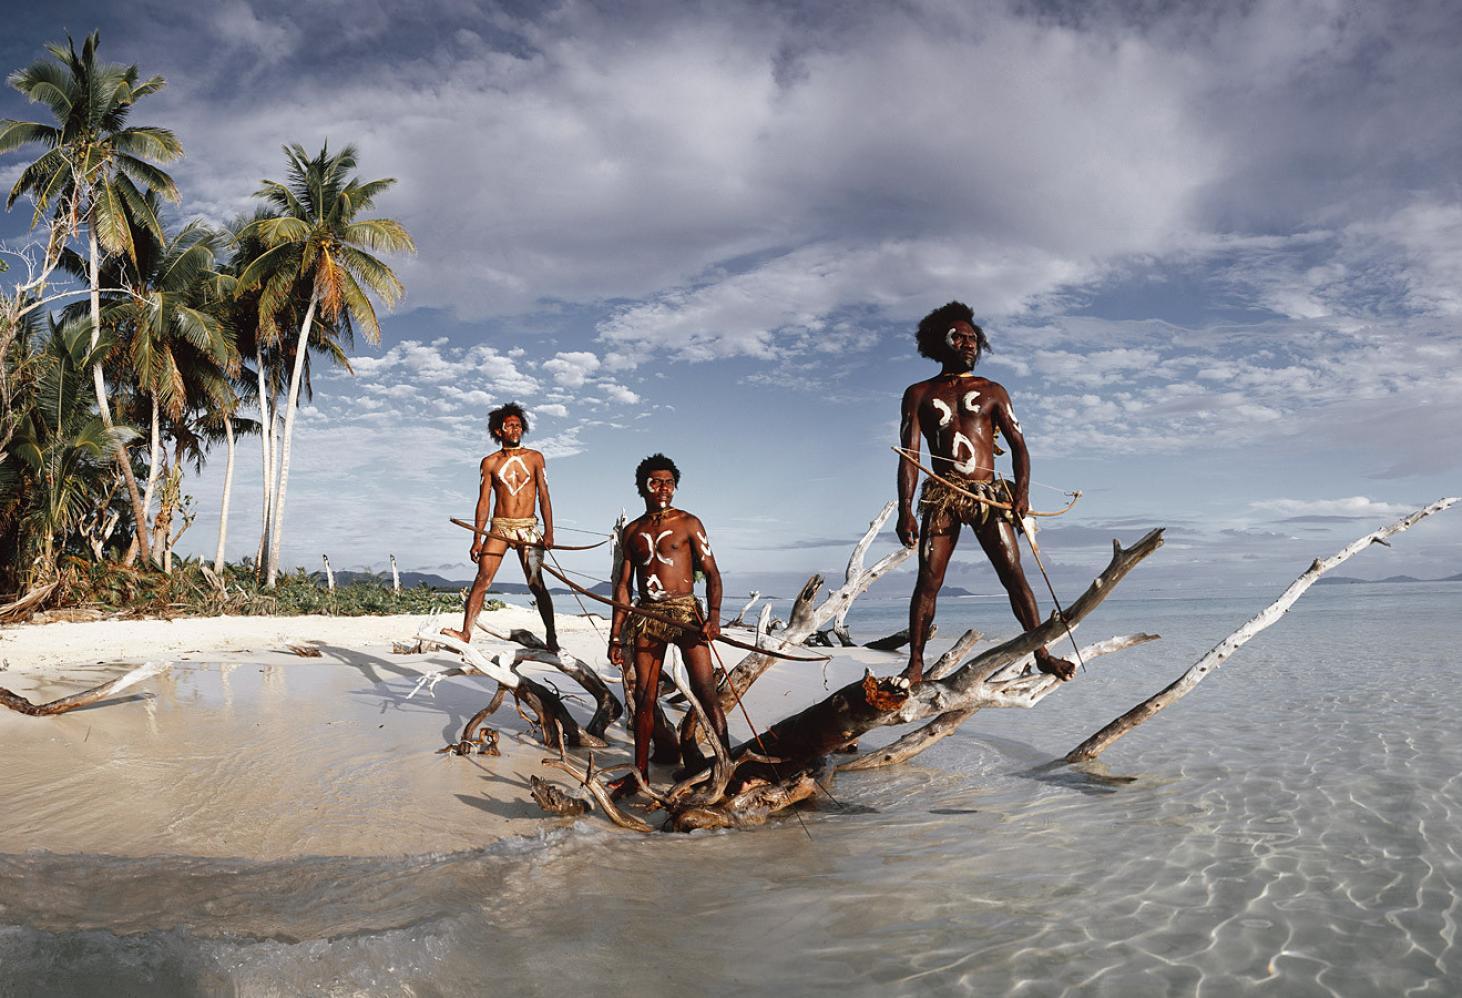 Вануату. Народ Вануату (Vanuatu)